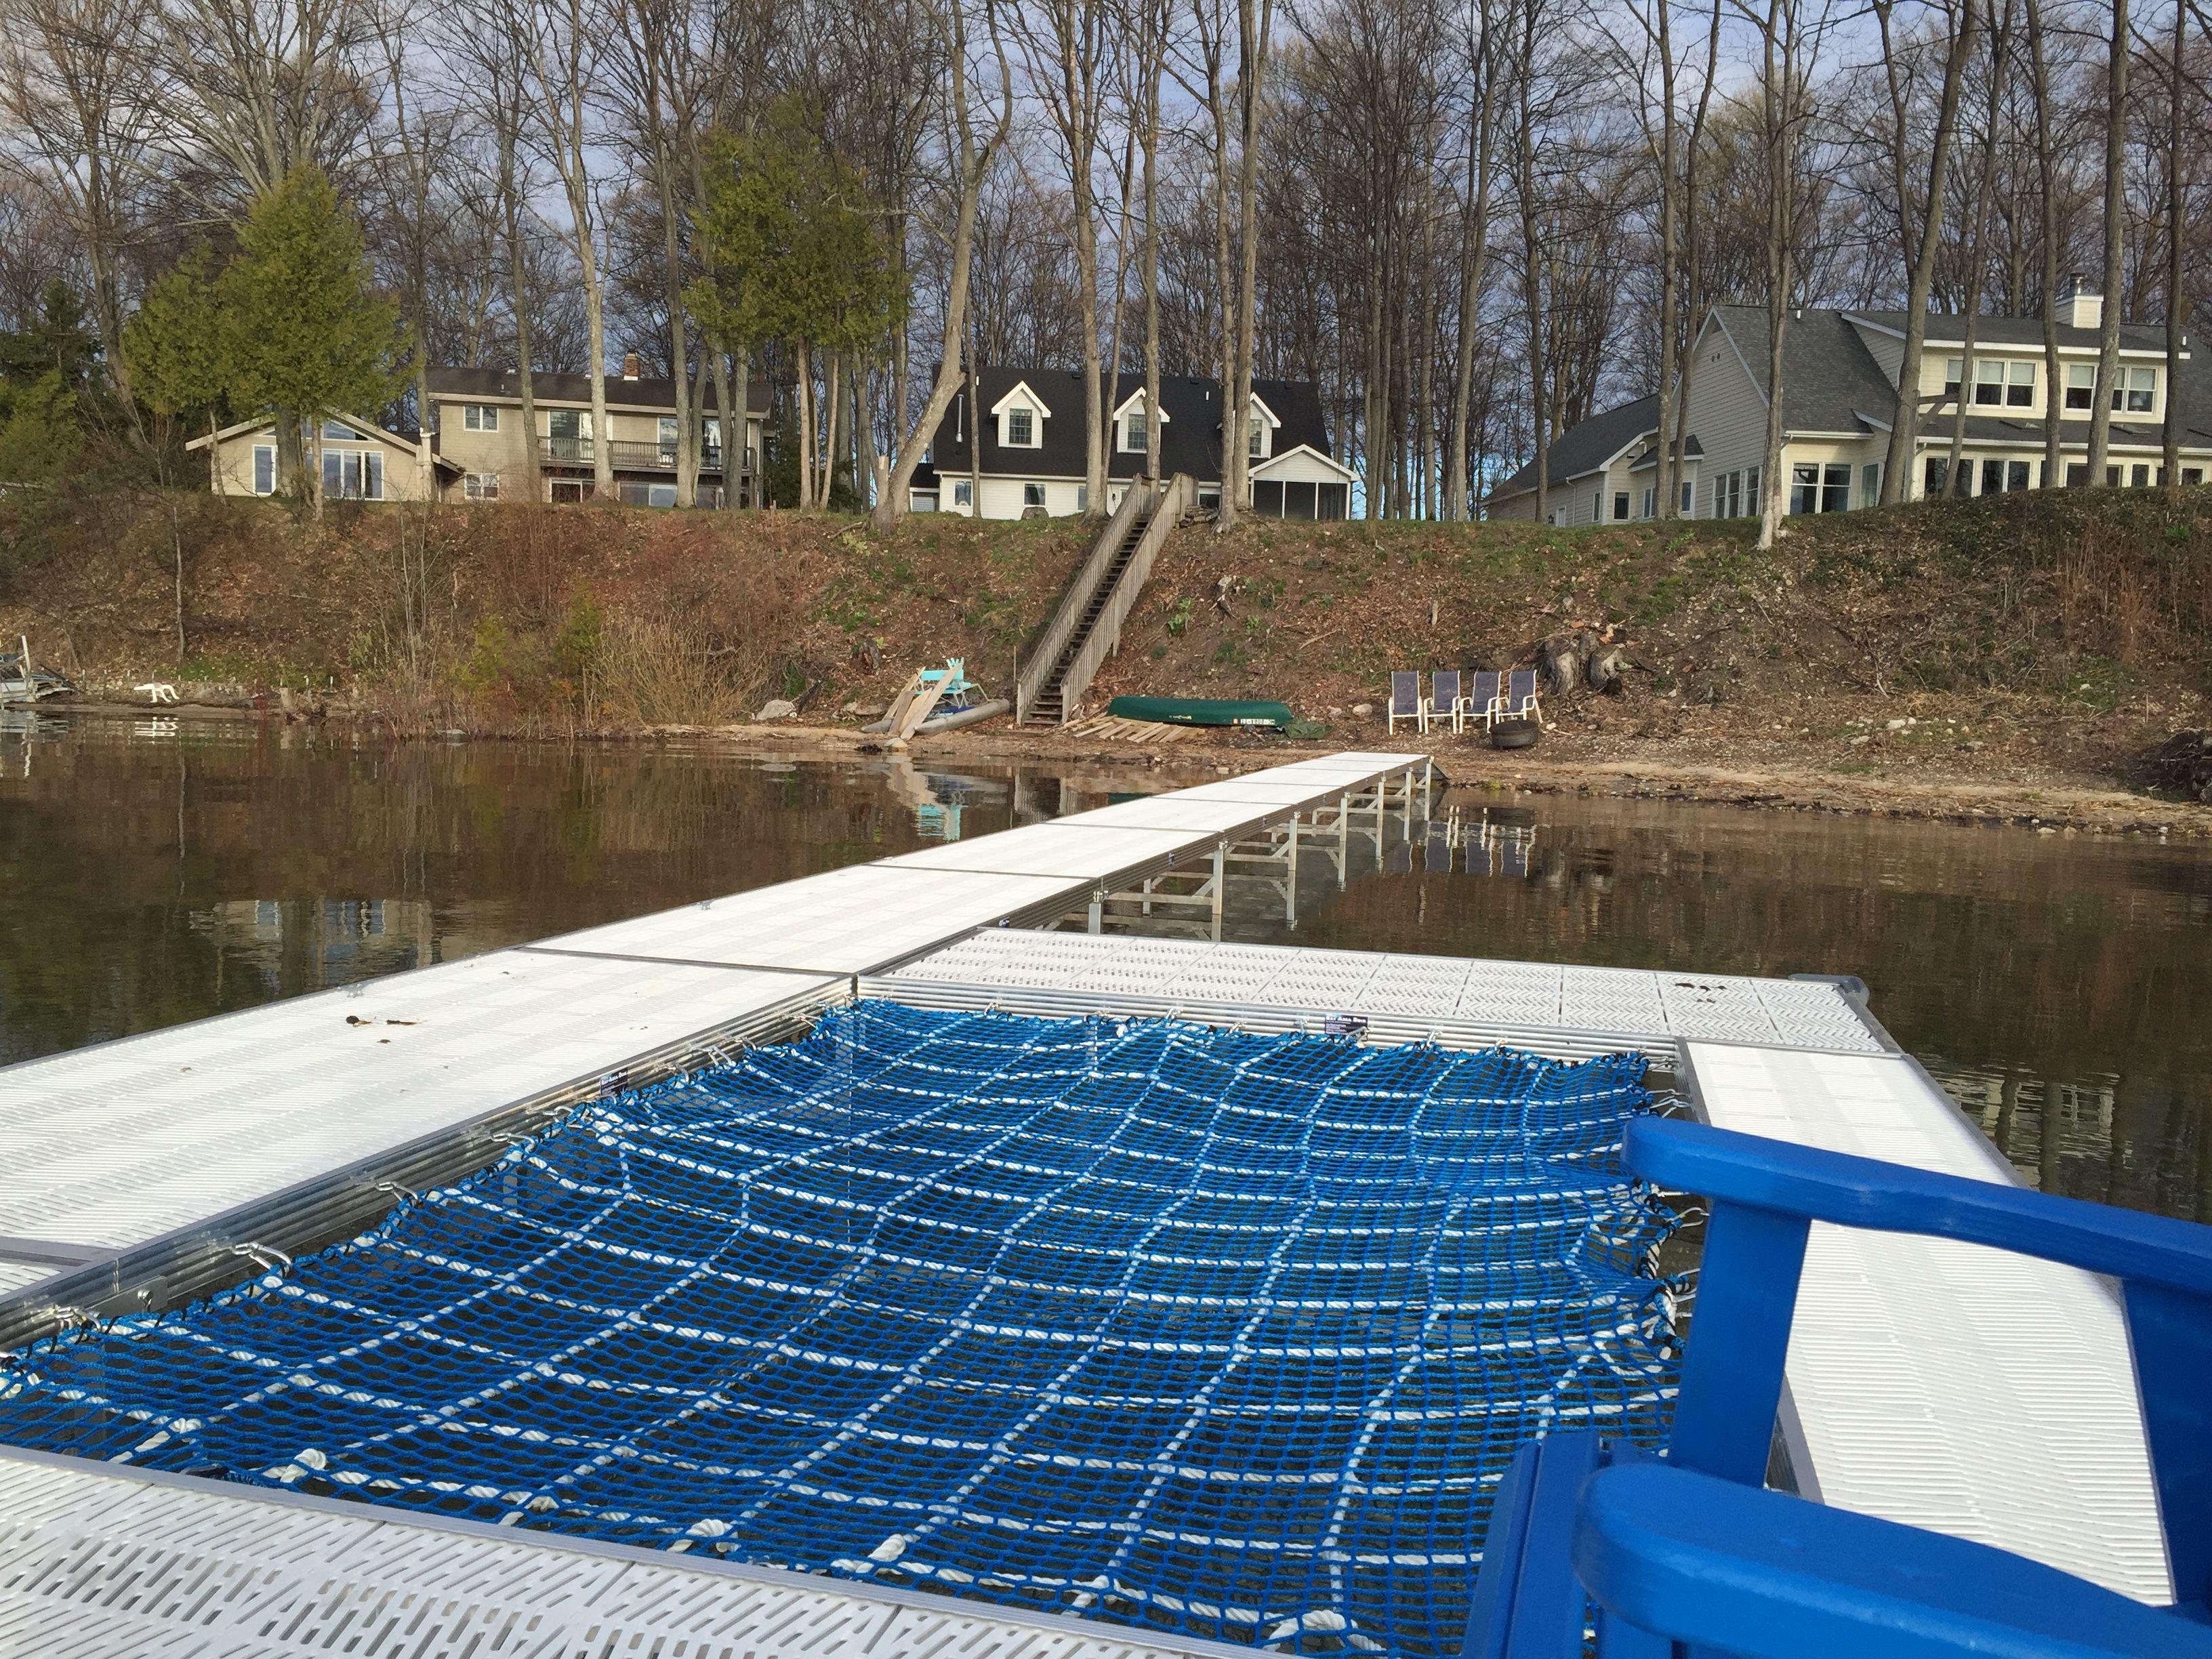 Installed A Custom Made Dock With Hammock Catamaran Net To